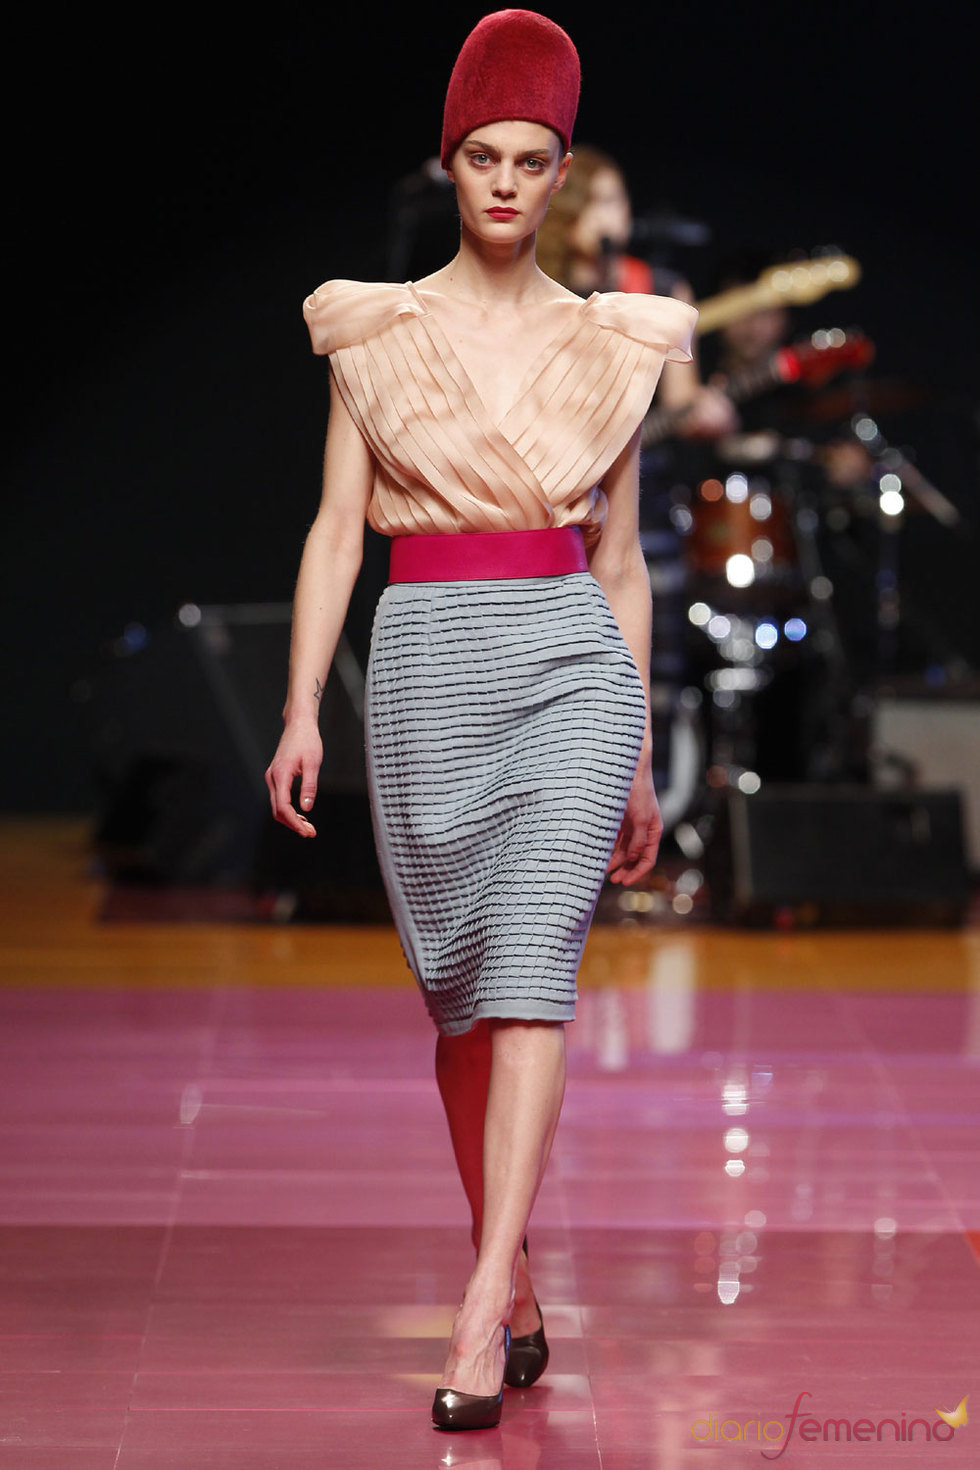 Duyos - Moda Mujer - Otoño Invierno